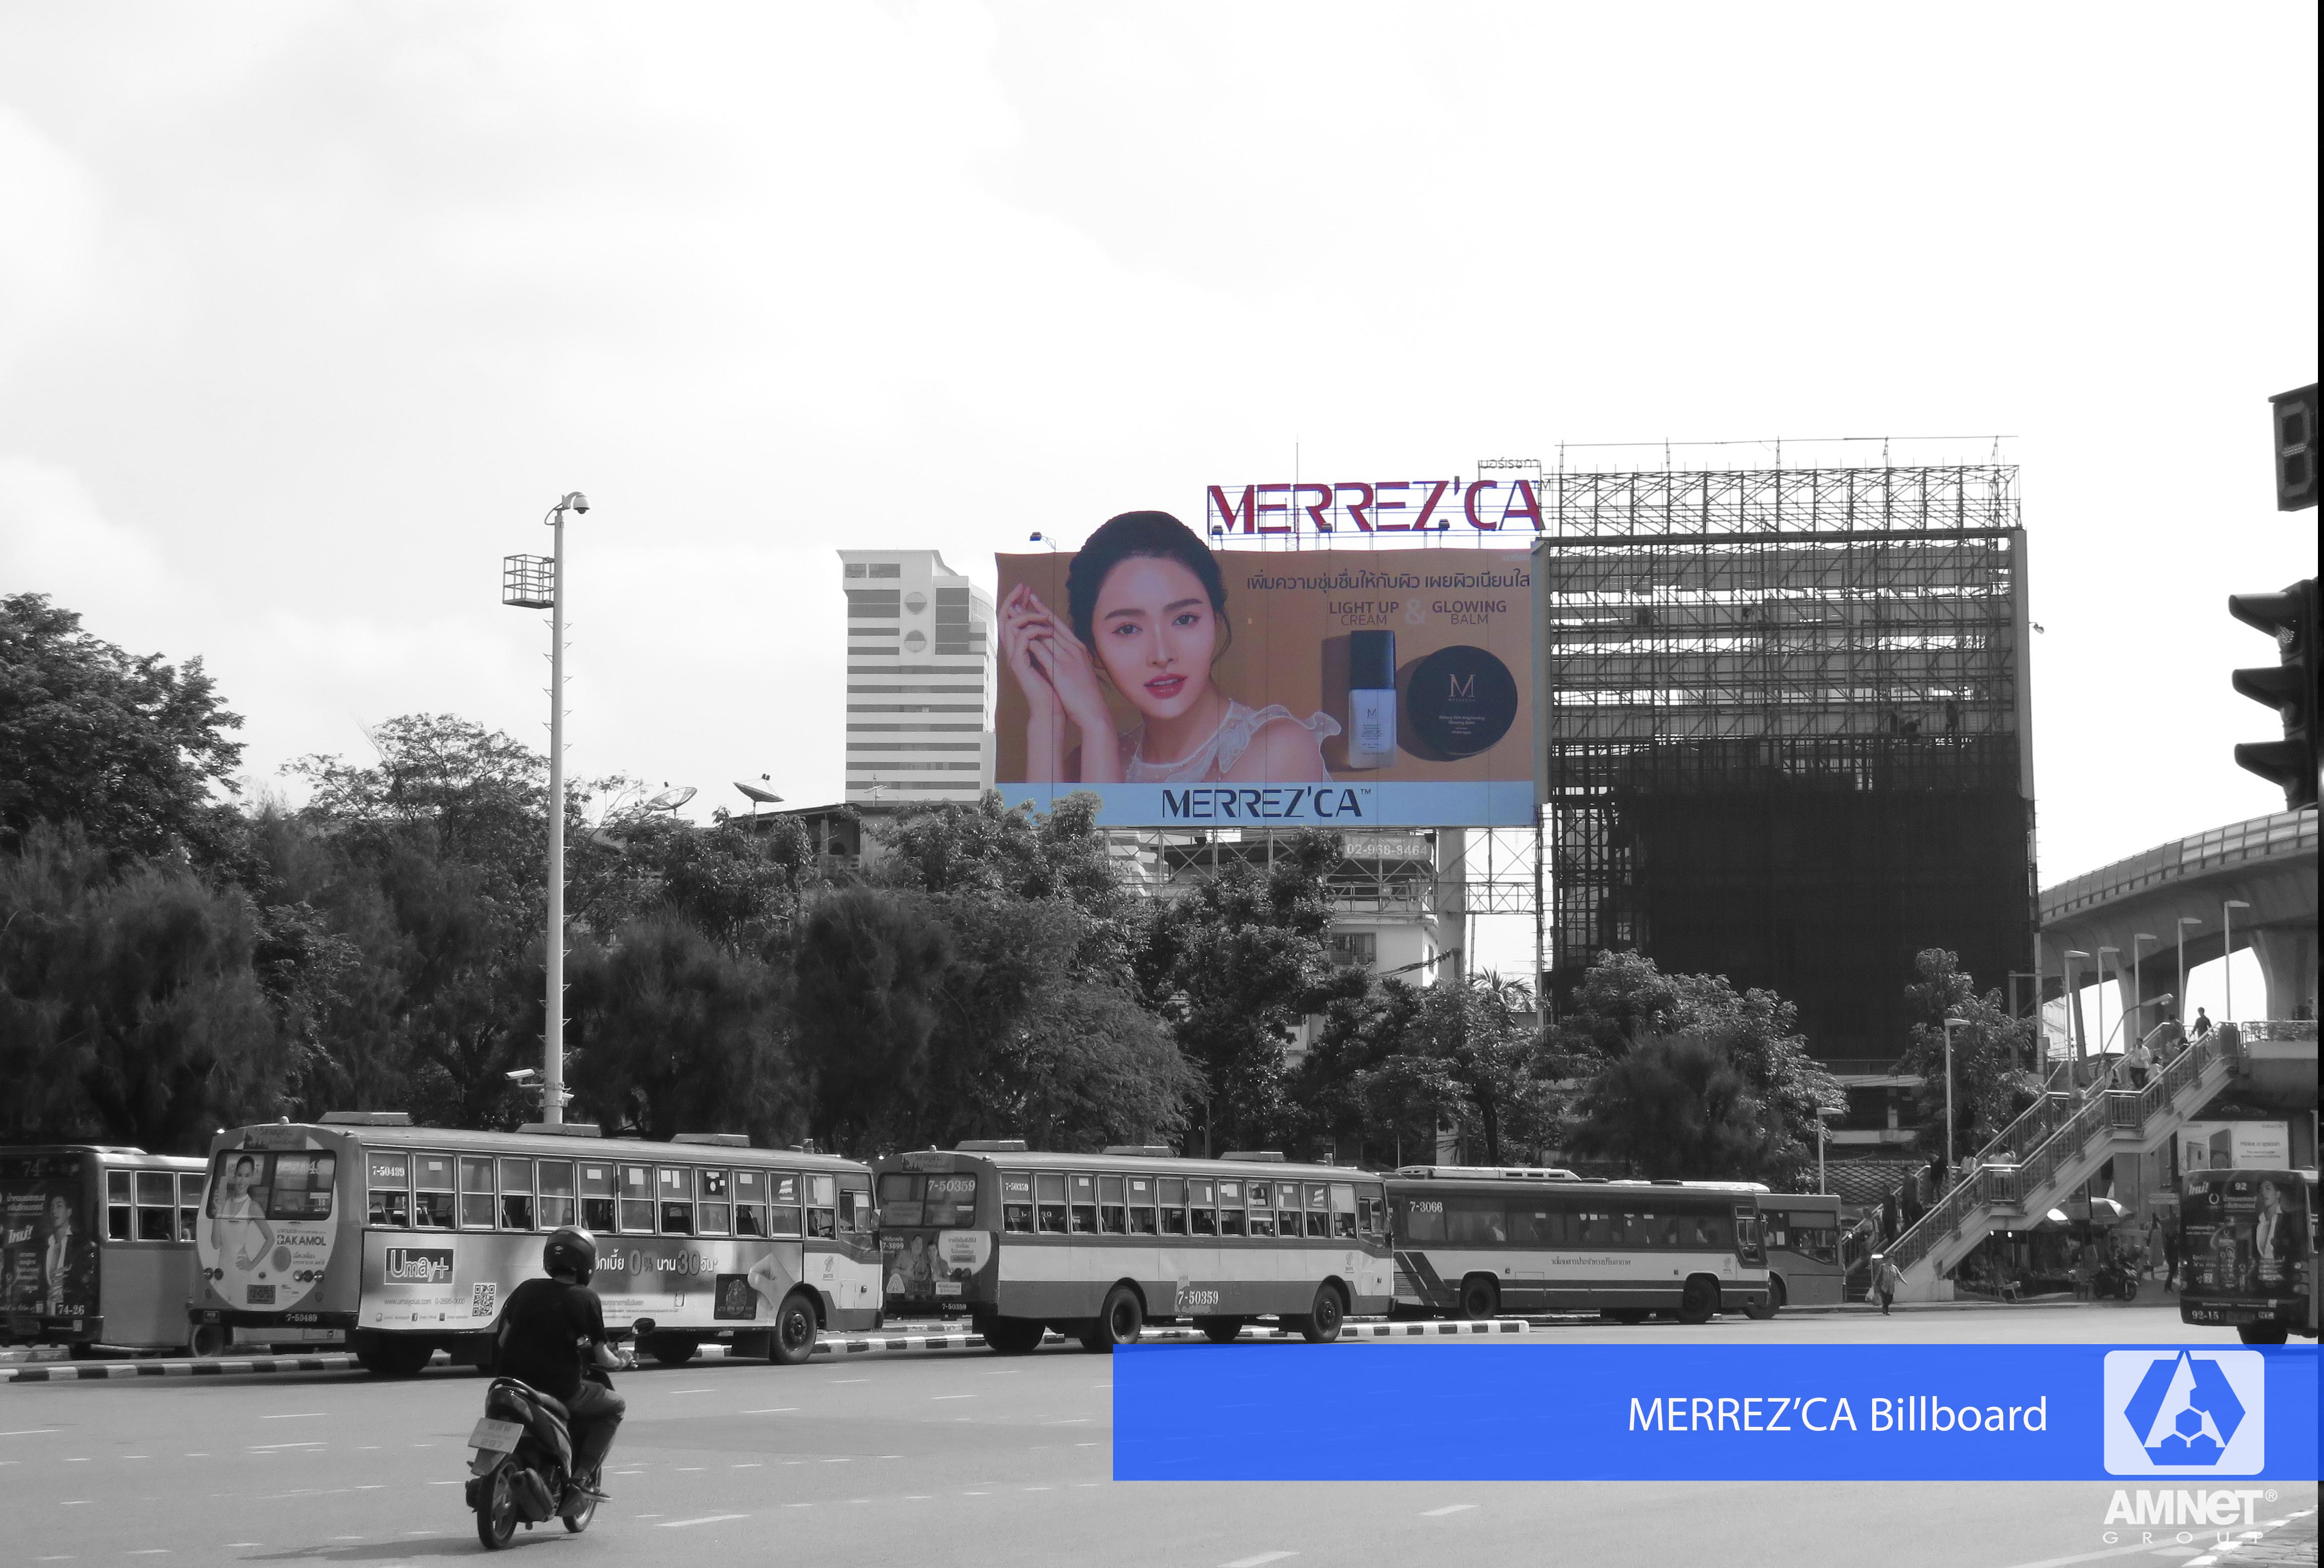 MERREZCAday